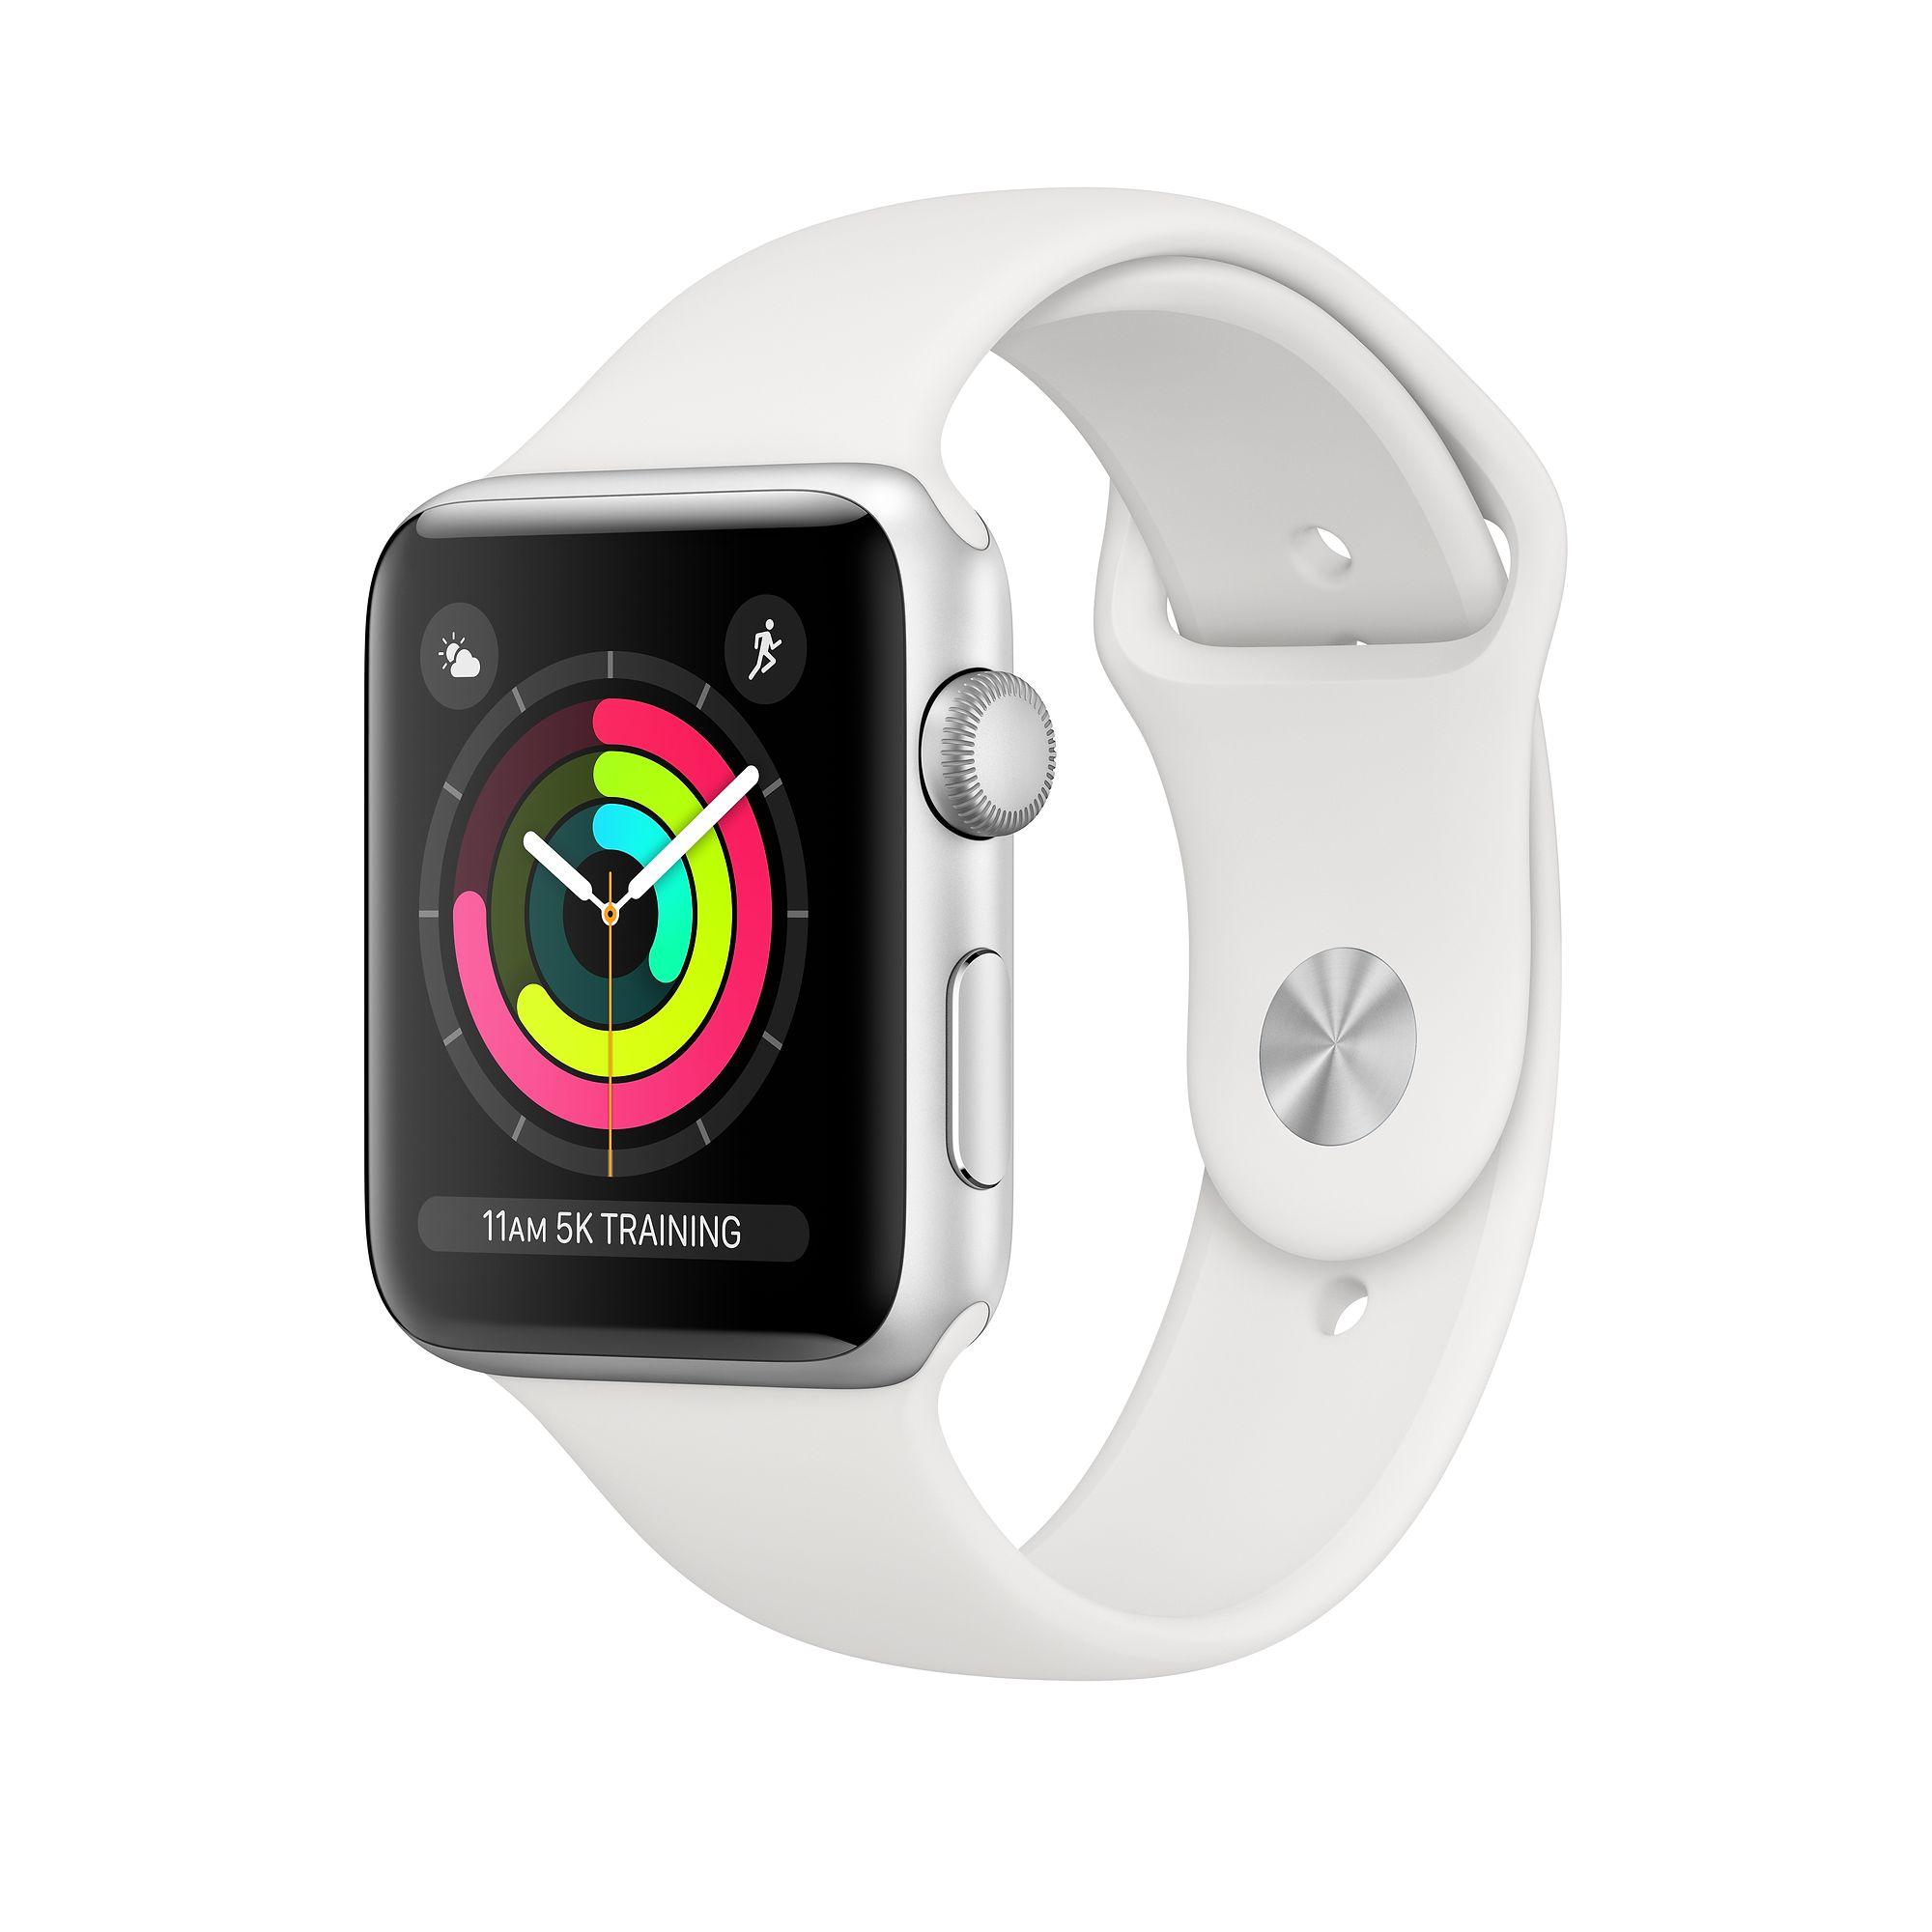 Apple Watch Series 3 38mm (GPS + Cellular) Silver Aluminum Case white Sport Band (MTGG2)